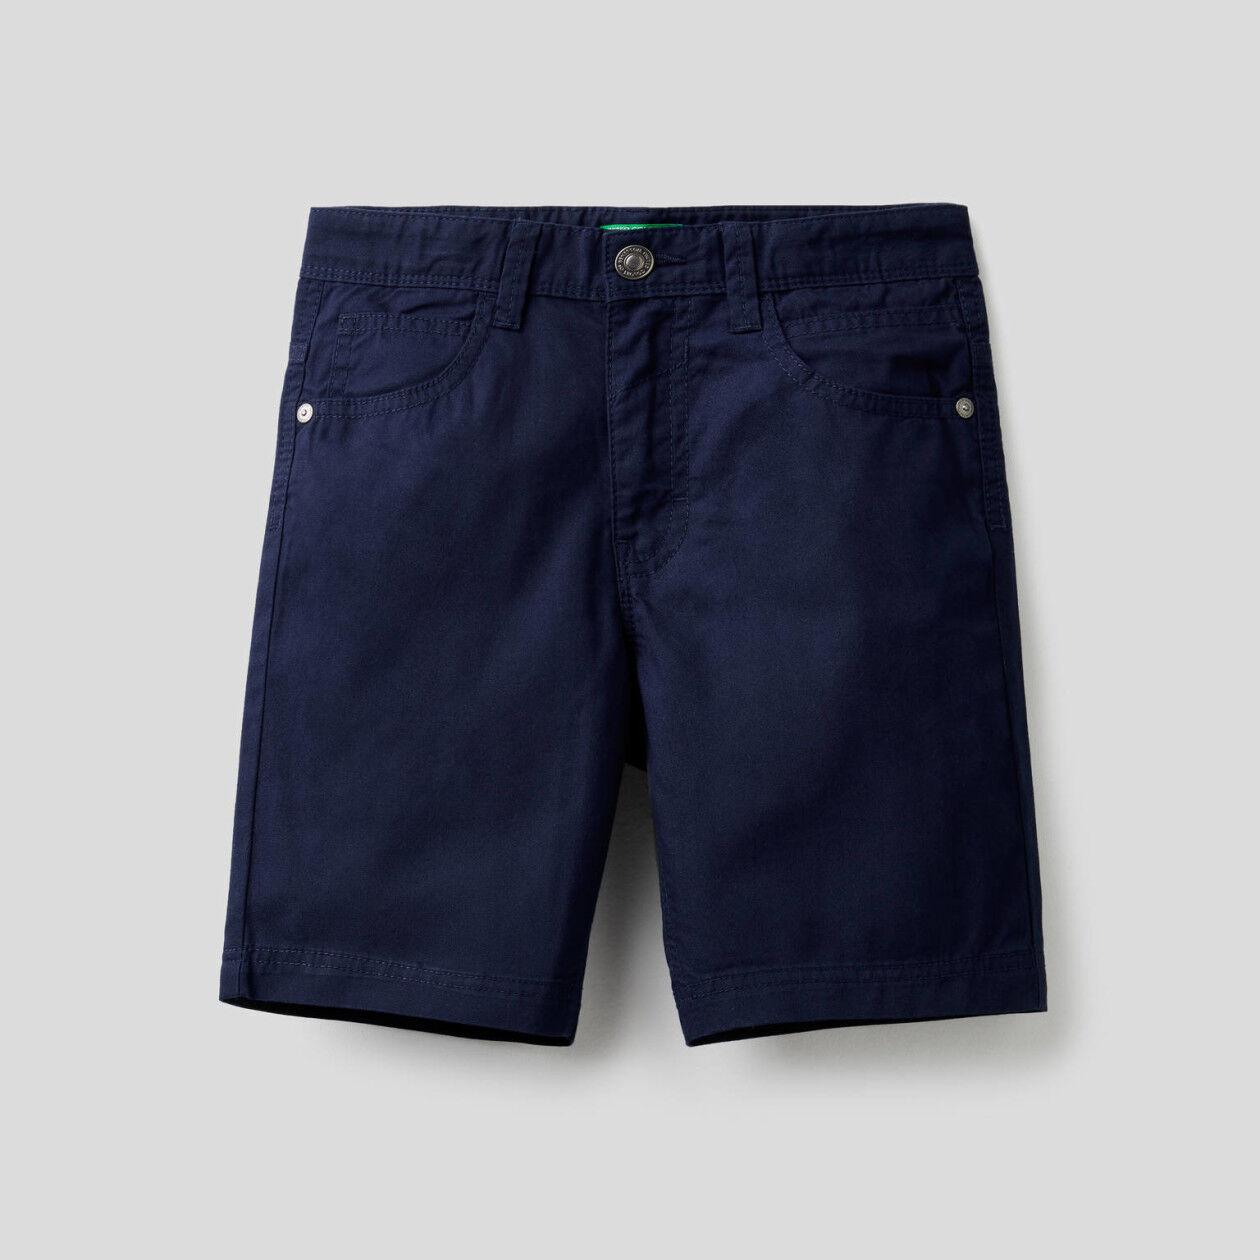 Five pocket shorts